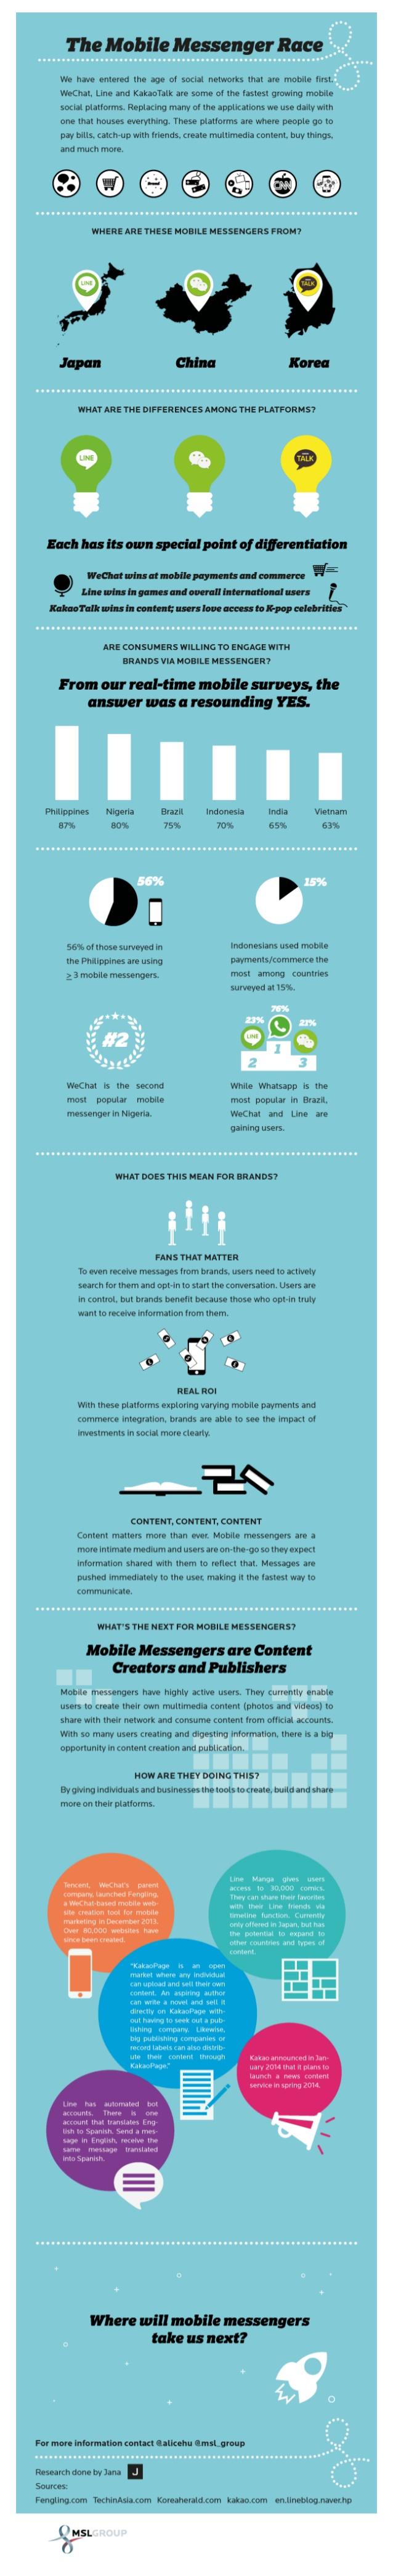 Mensajería móvil: un ascenso imparable